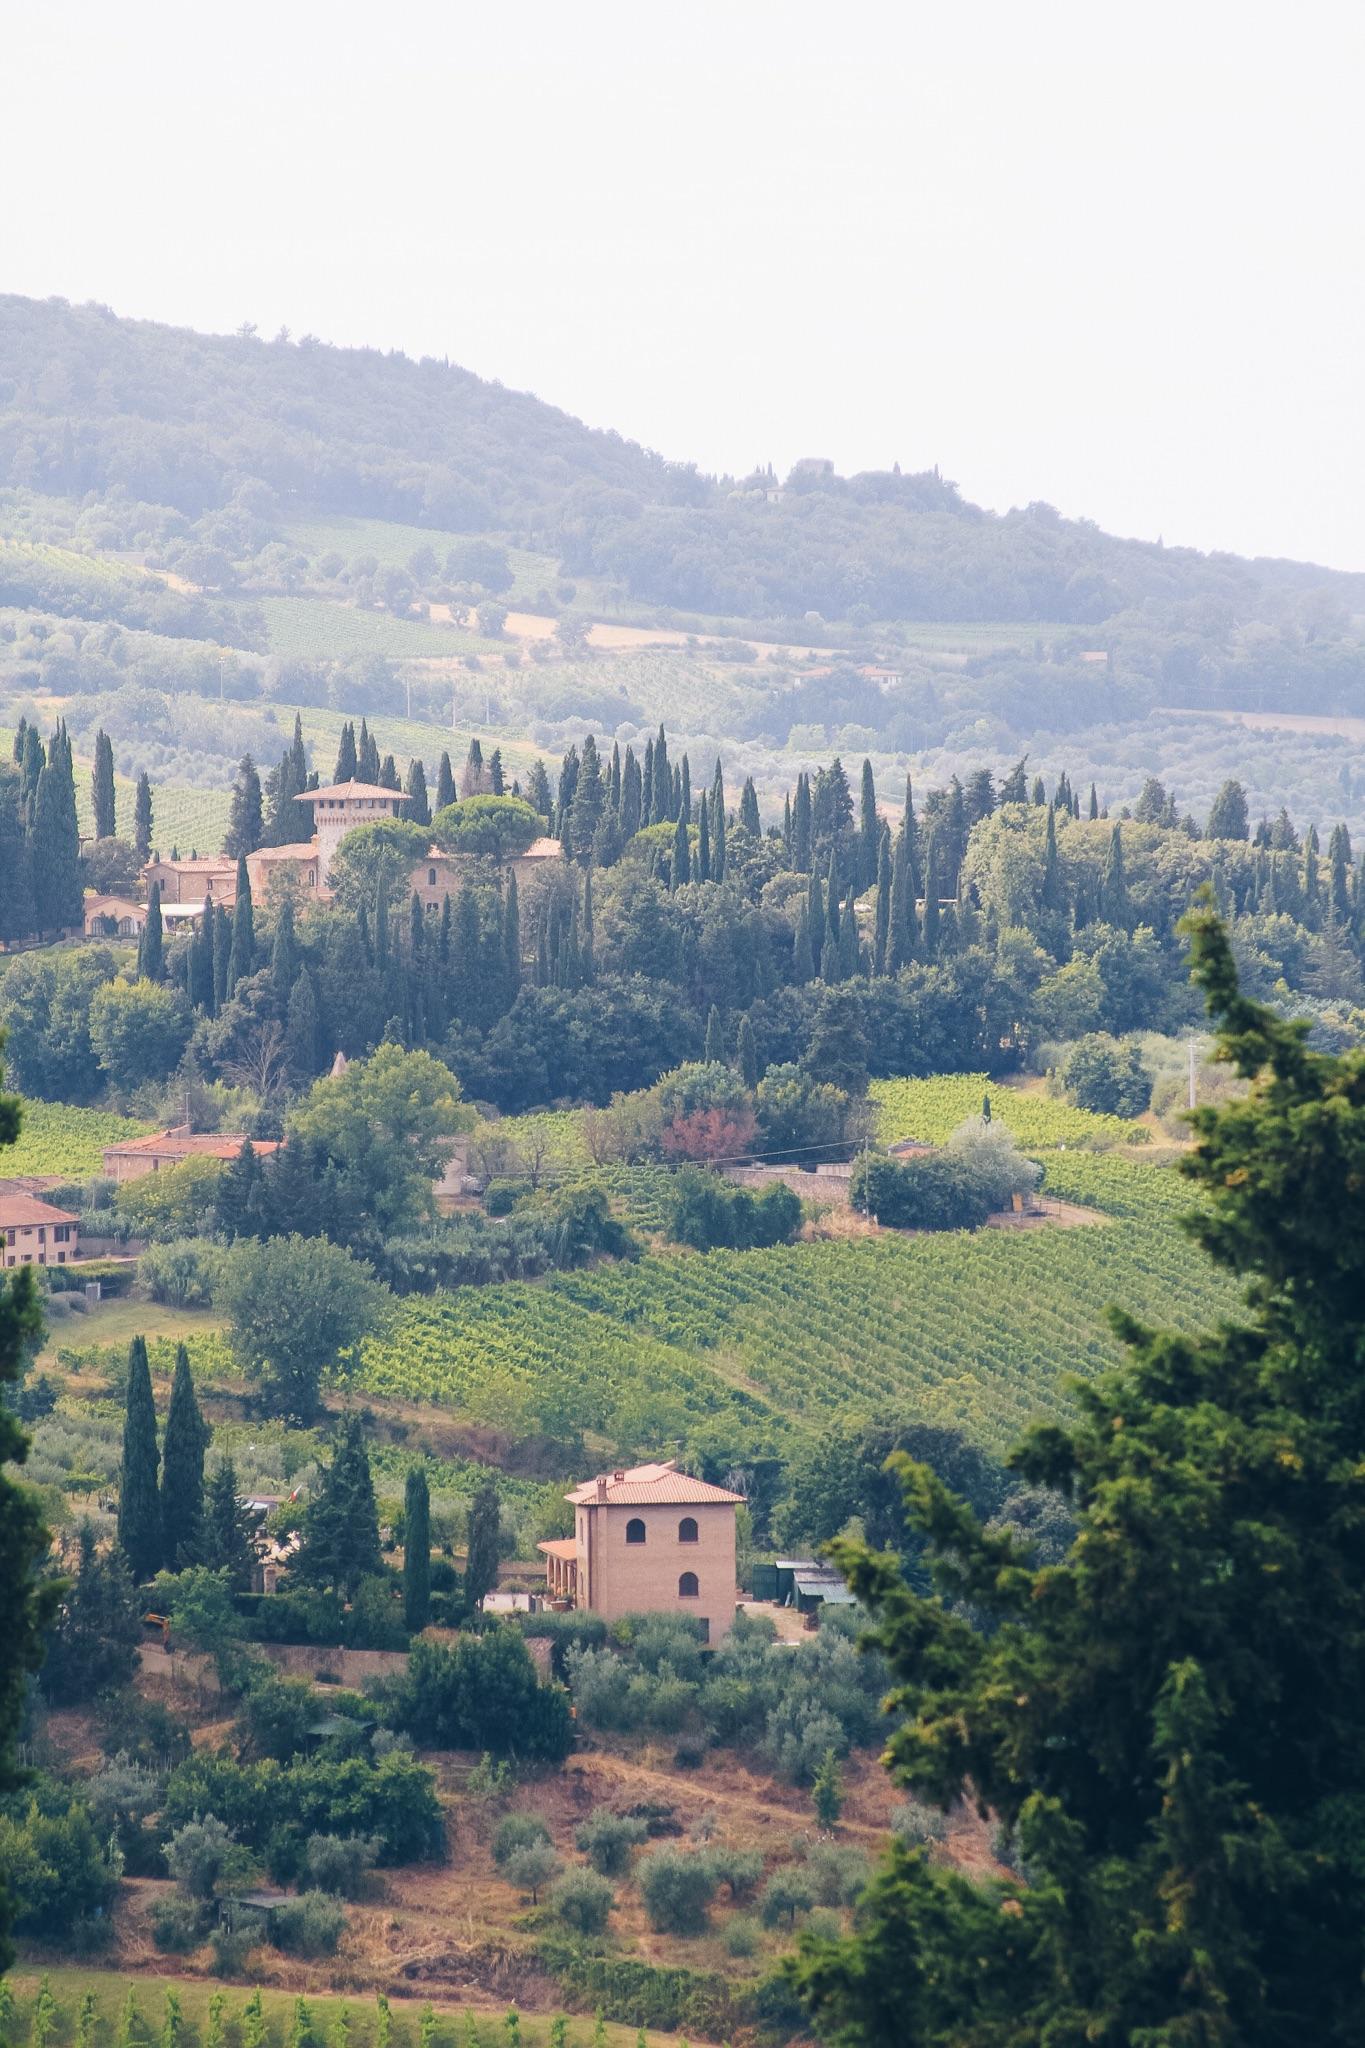 Ten-Days-Florence-Tuscany-Travel-Guide-MonicaFrancis-9